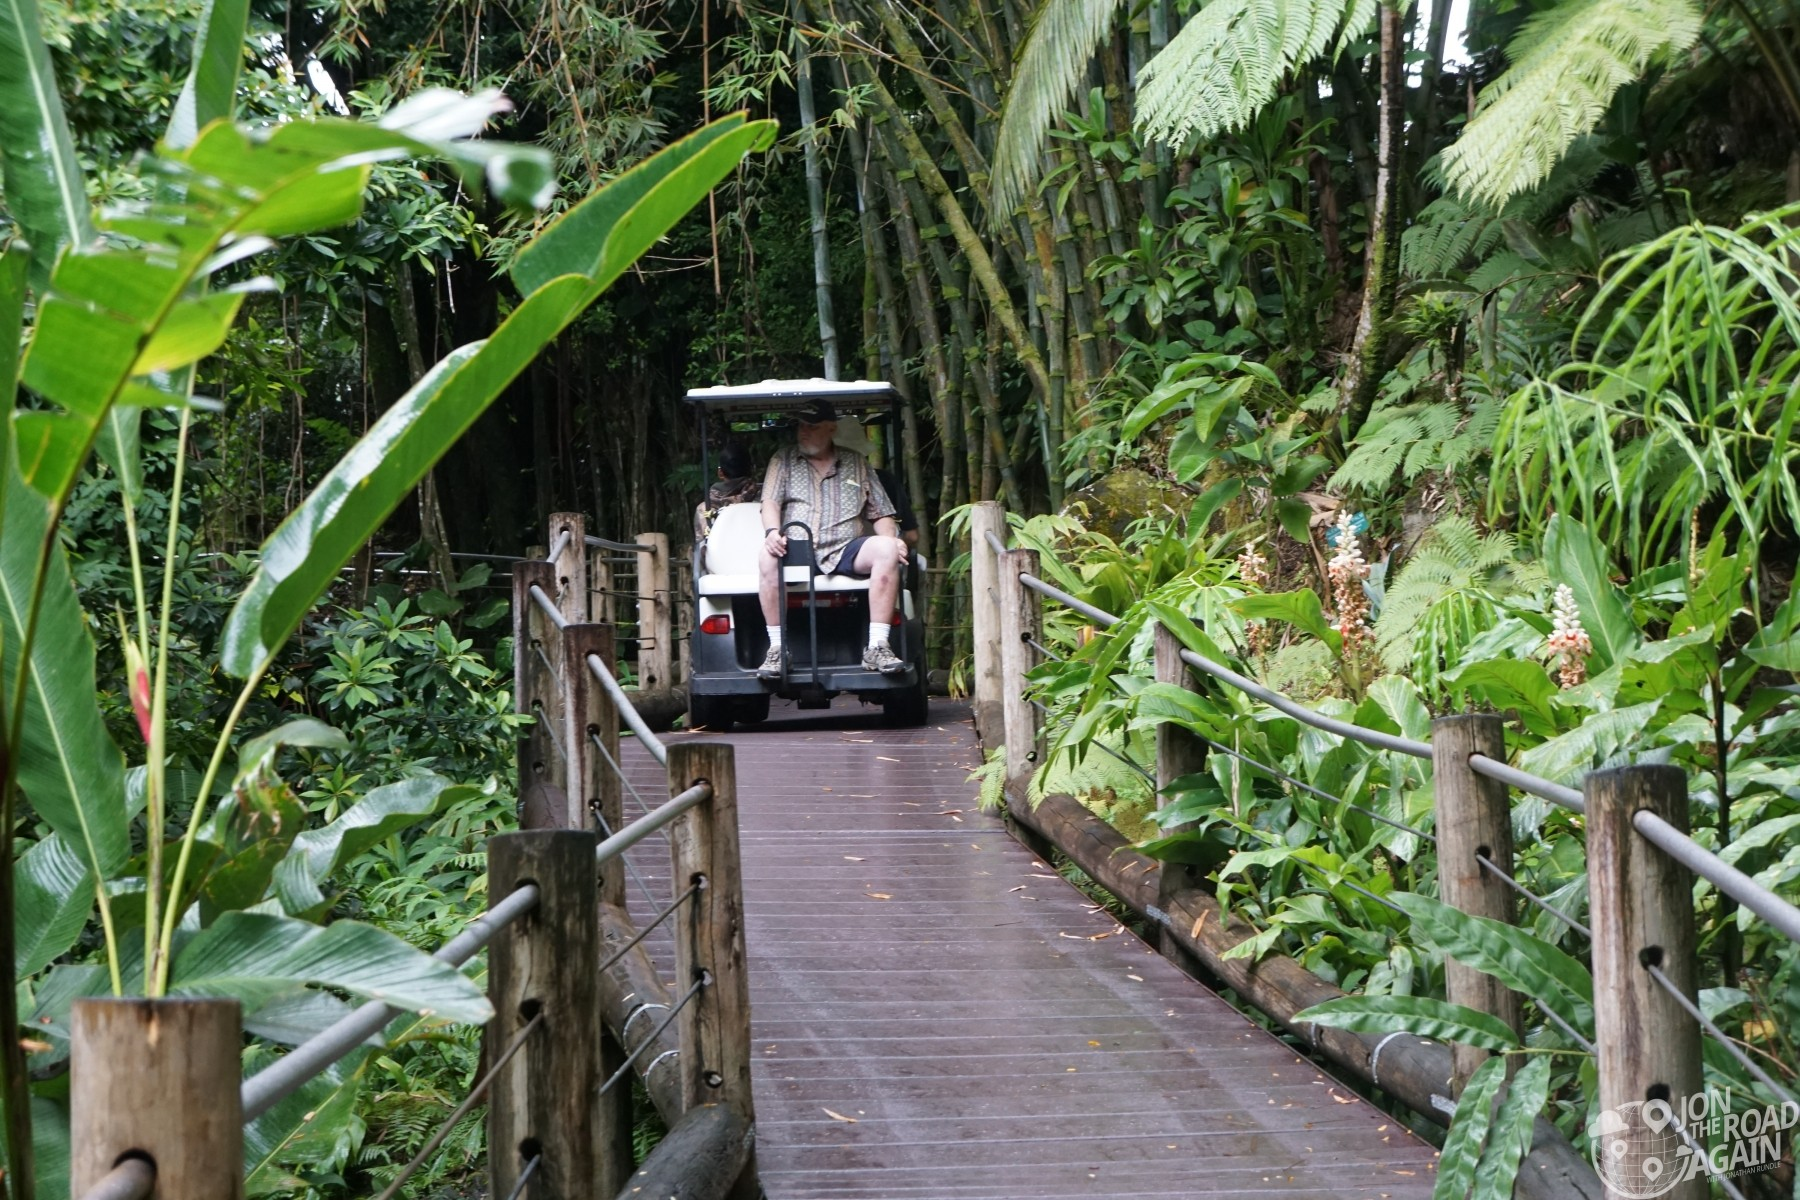 Hawaii Tropical Botanical Garden walkway